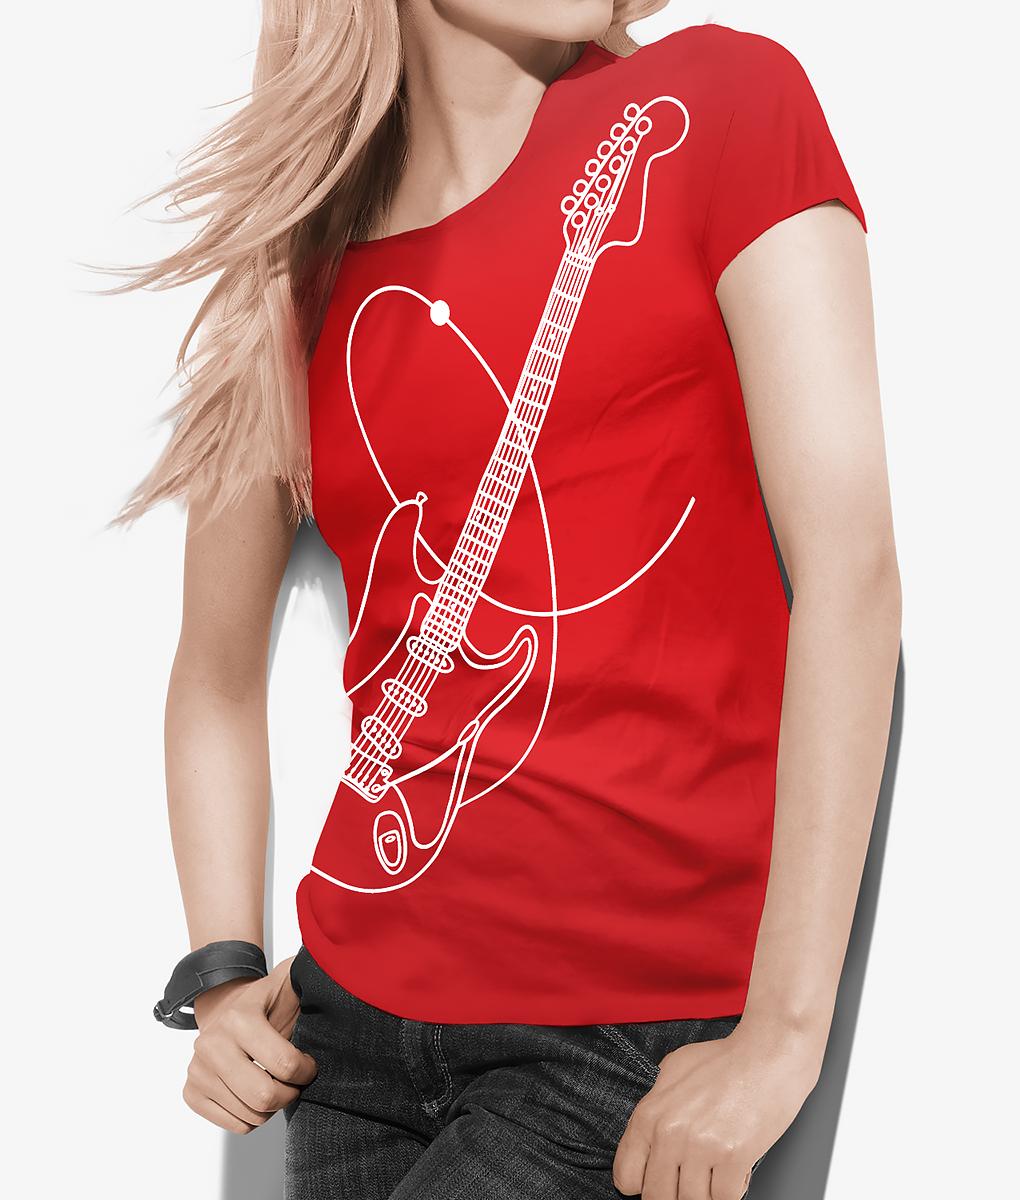 t-shirt_woman_3